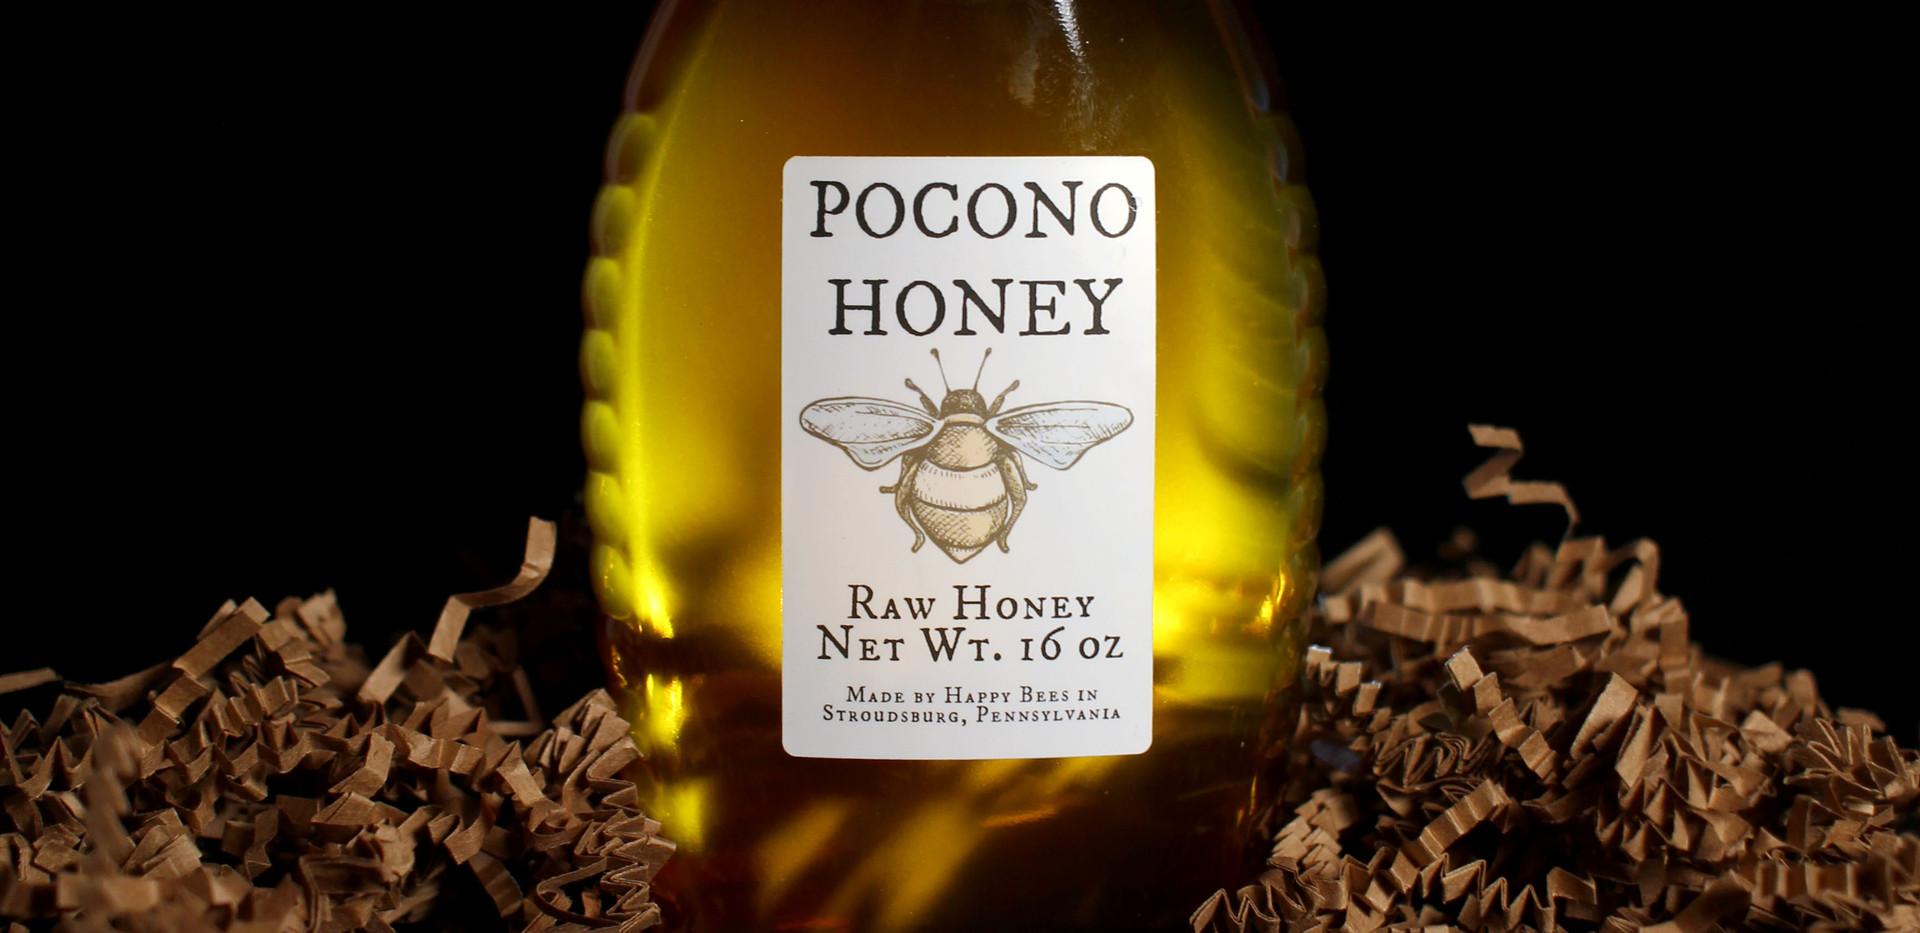 Pocono Honey Product Shot